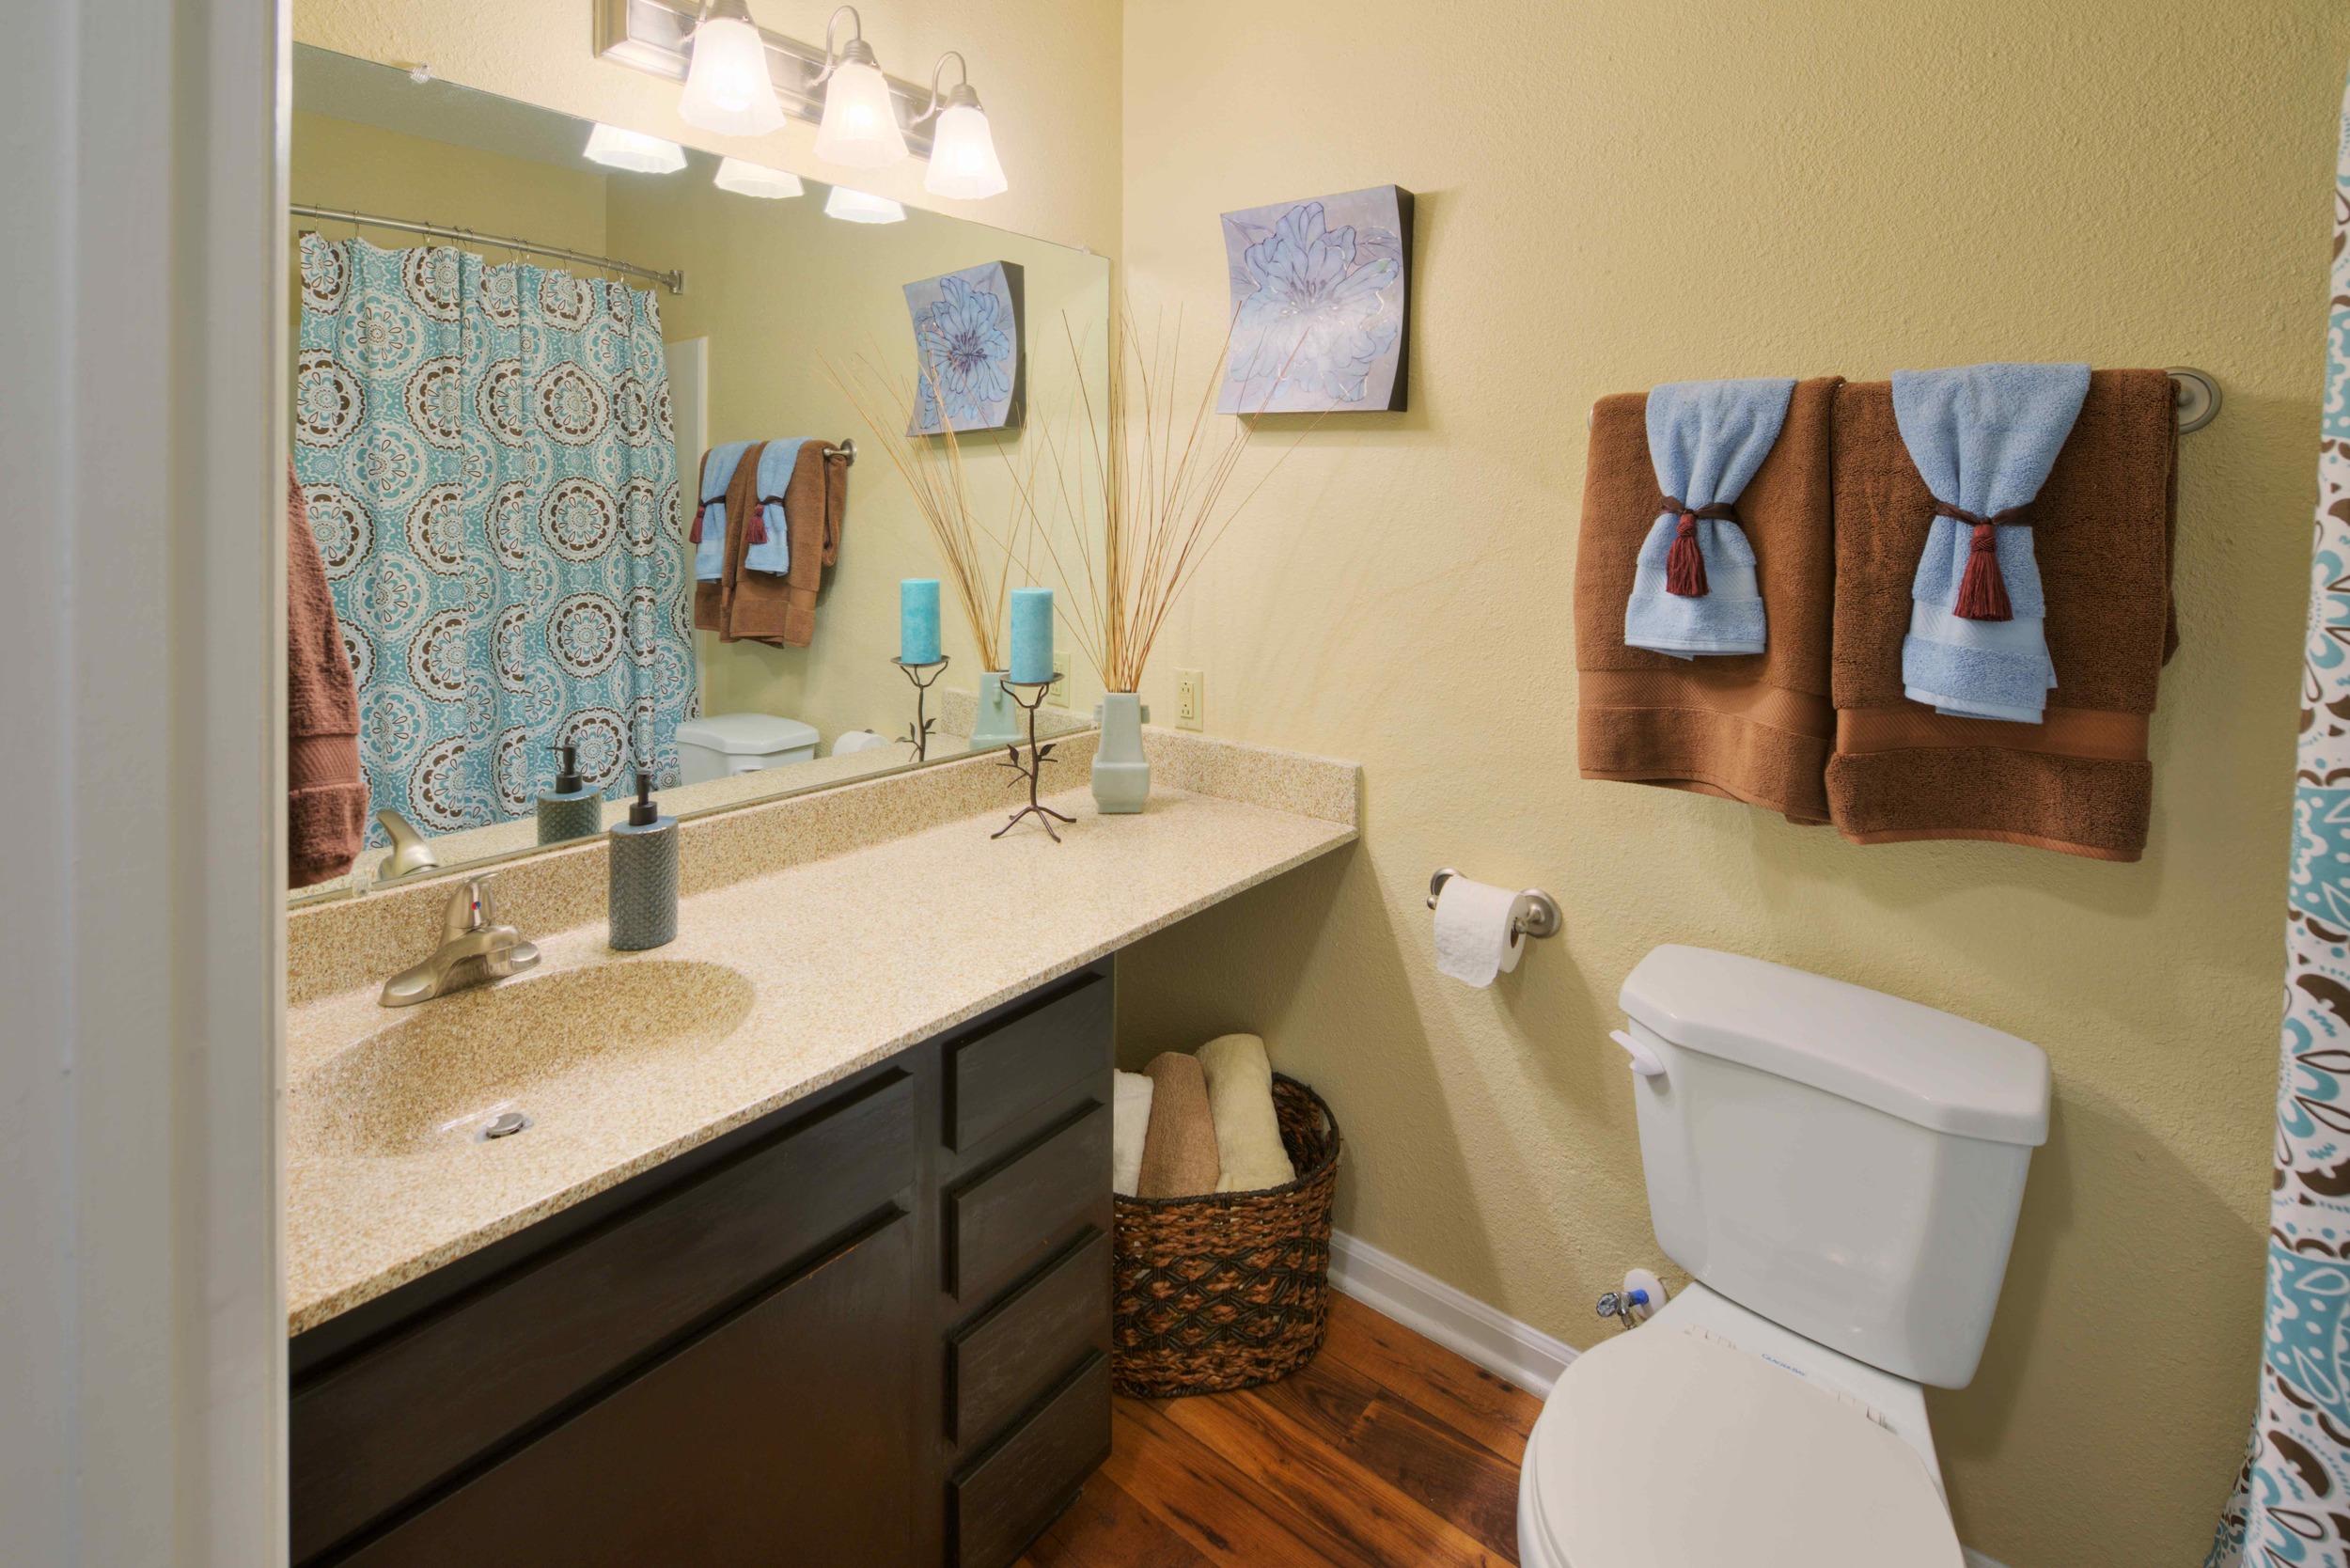 Bathroom - Renovated.jpg